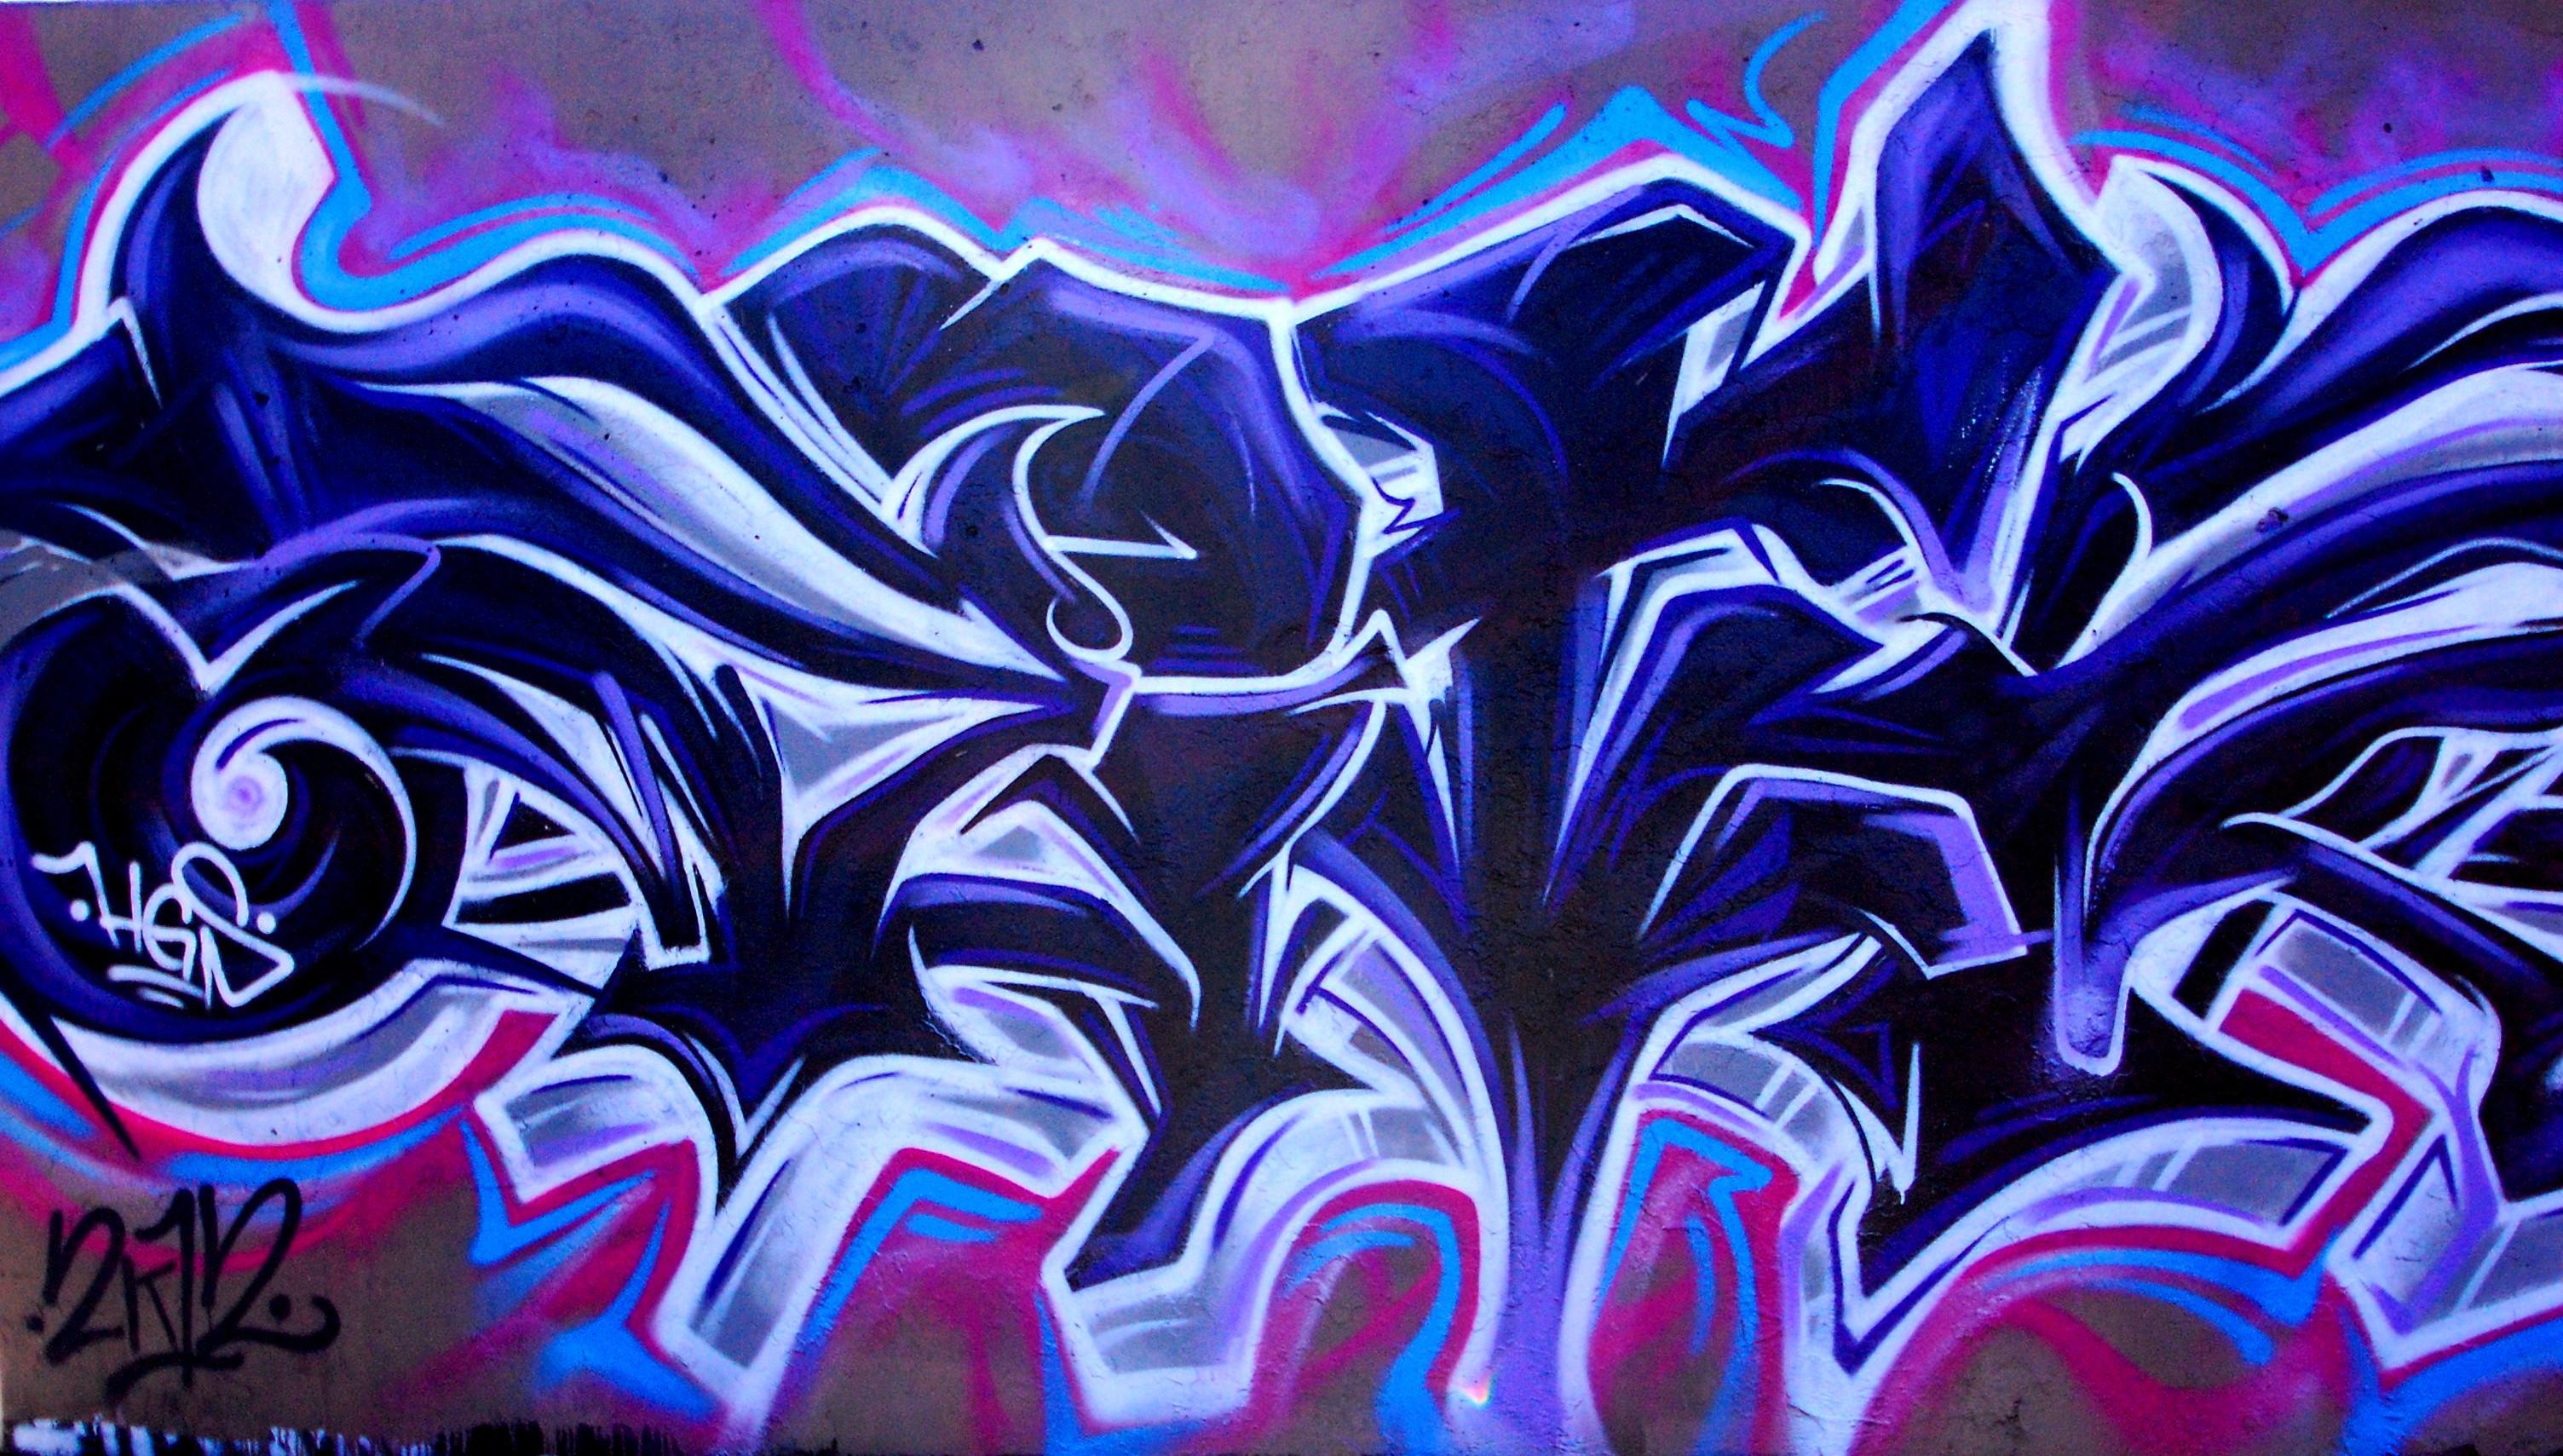 Graffiti Background Maker